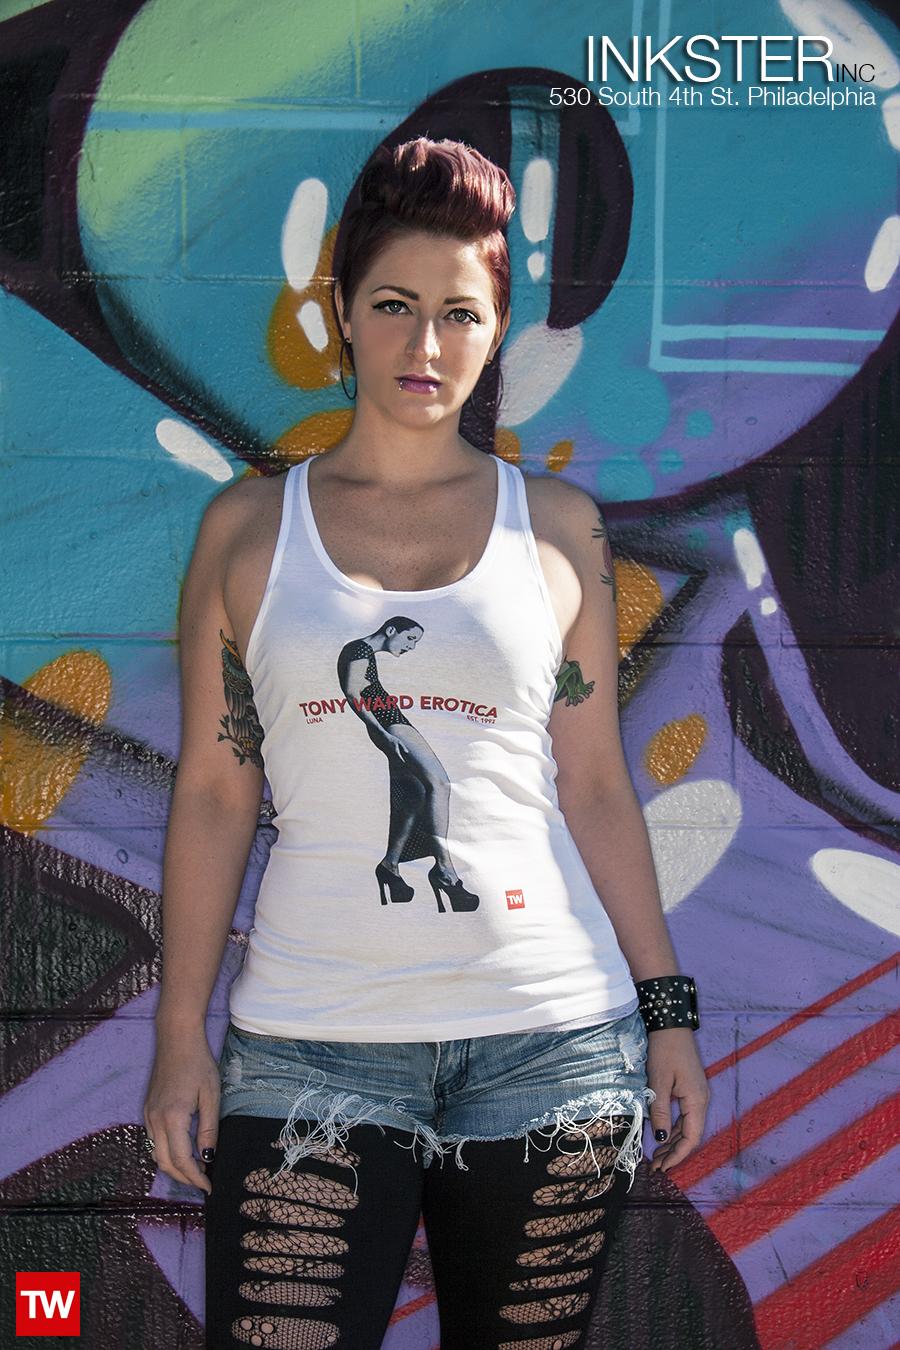 Tony_Ward_Photography-store_Tee_shirts_luna_mindy_chandler_grafitti_art_models_erotica_inkster_inc_south_street_philadelphia